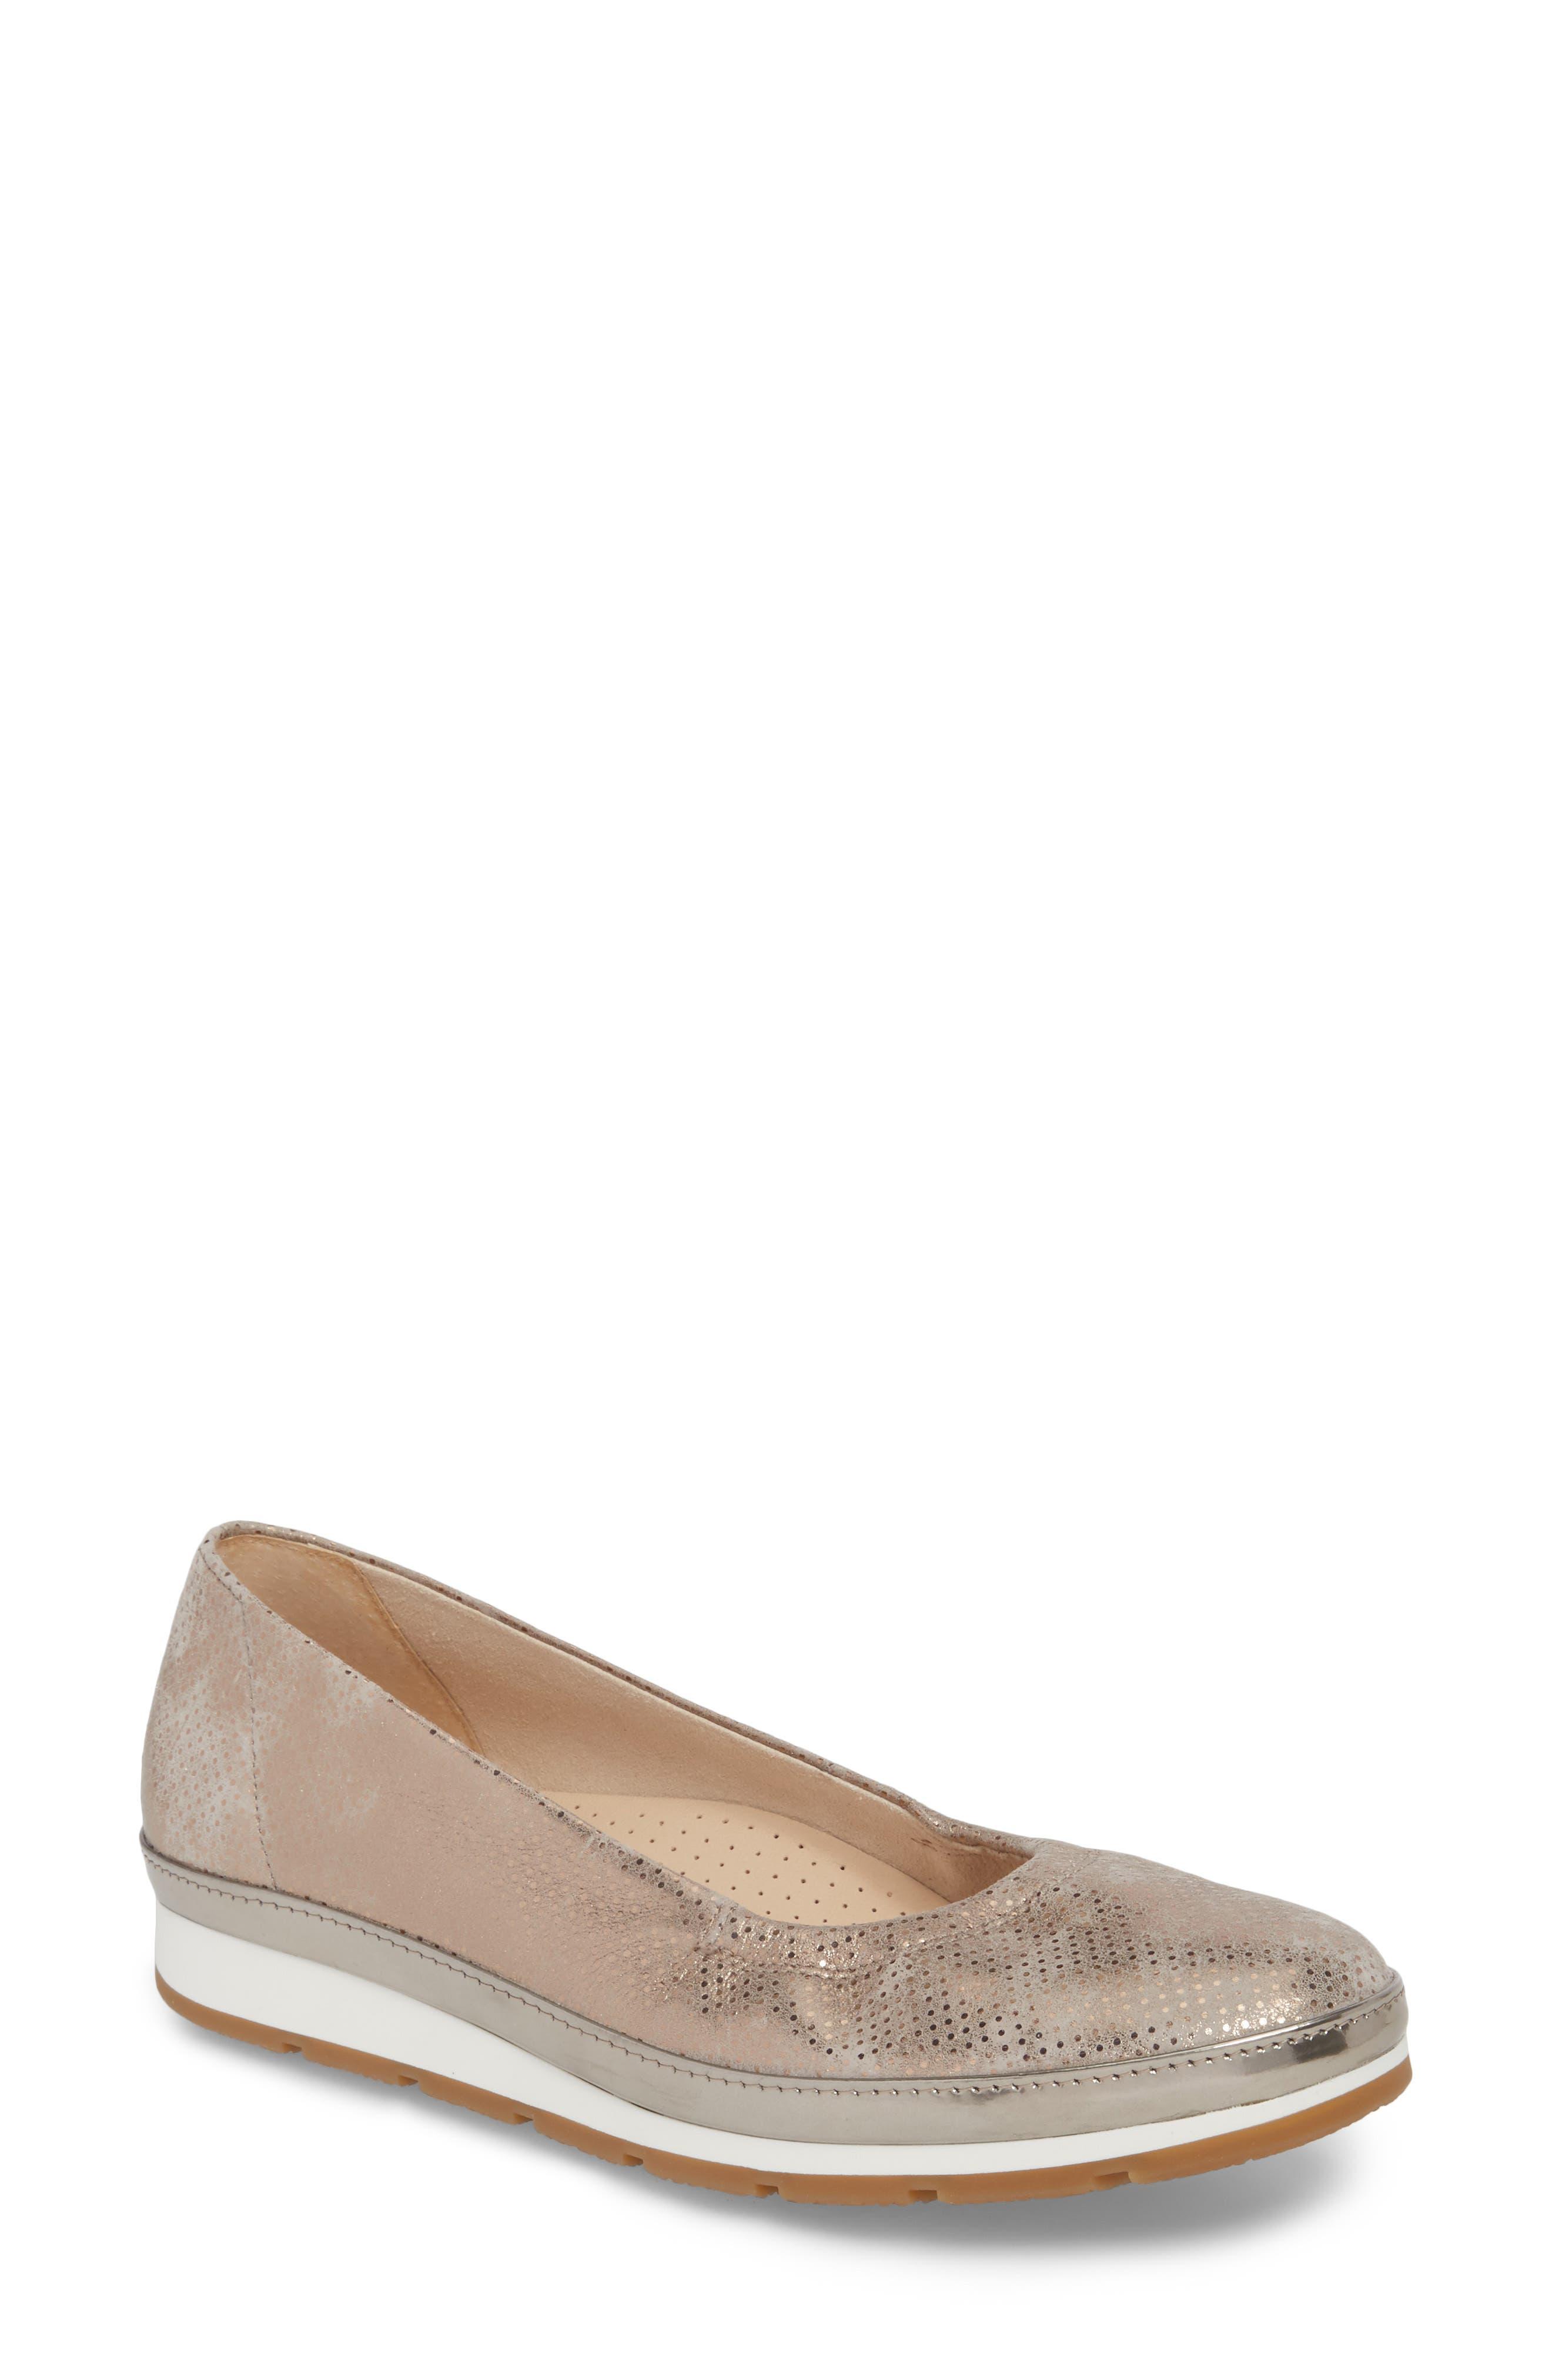 Ballet Wedge,                         Main,                         color, Beige Metallic Leather